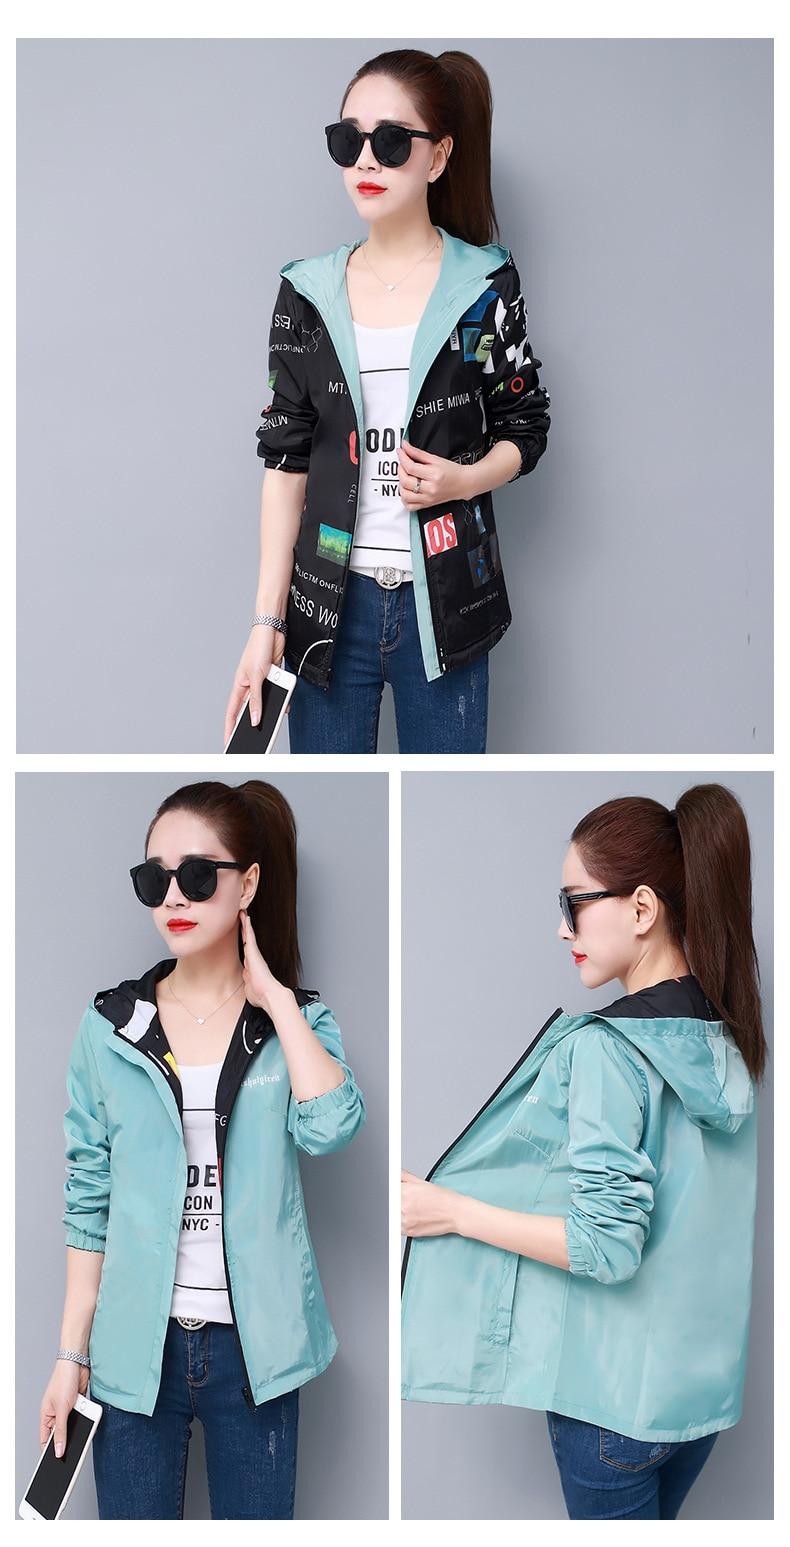 He2f769b7f8e4472aa4ed53d16340ac66b Streetwear Hooded Printed jacket women And Causal windbreaker Basic Jackets 2019 New Reversible baseball Zippers jacket 4XL